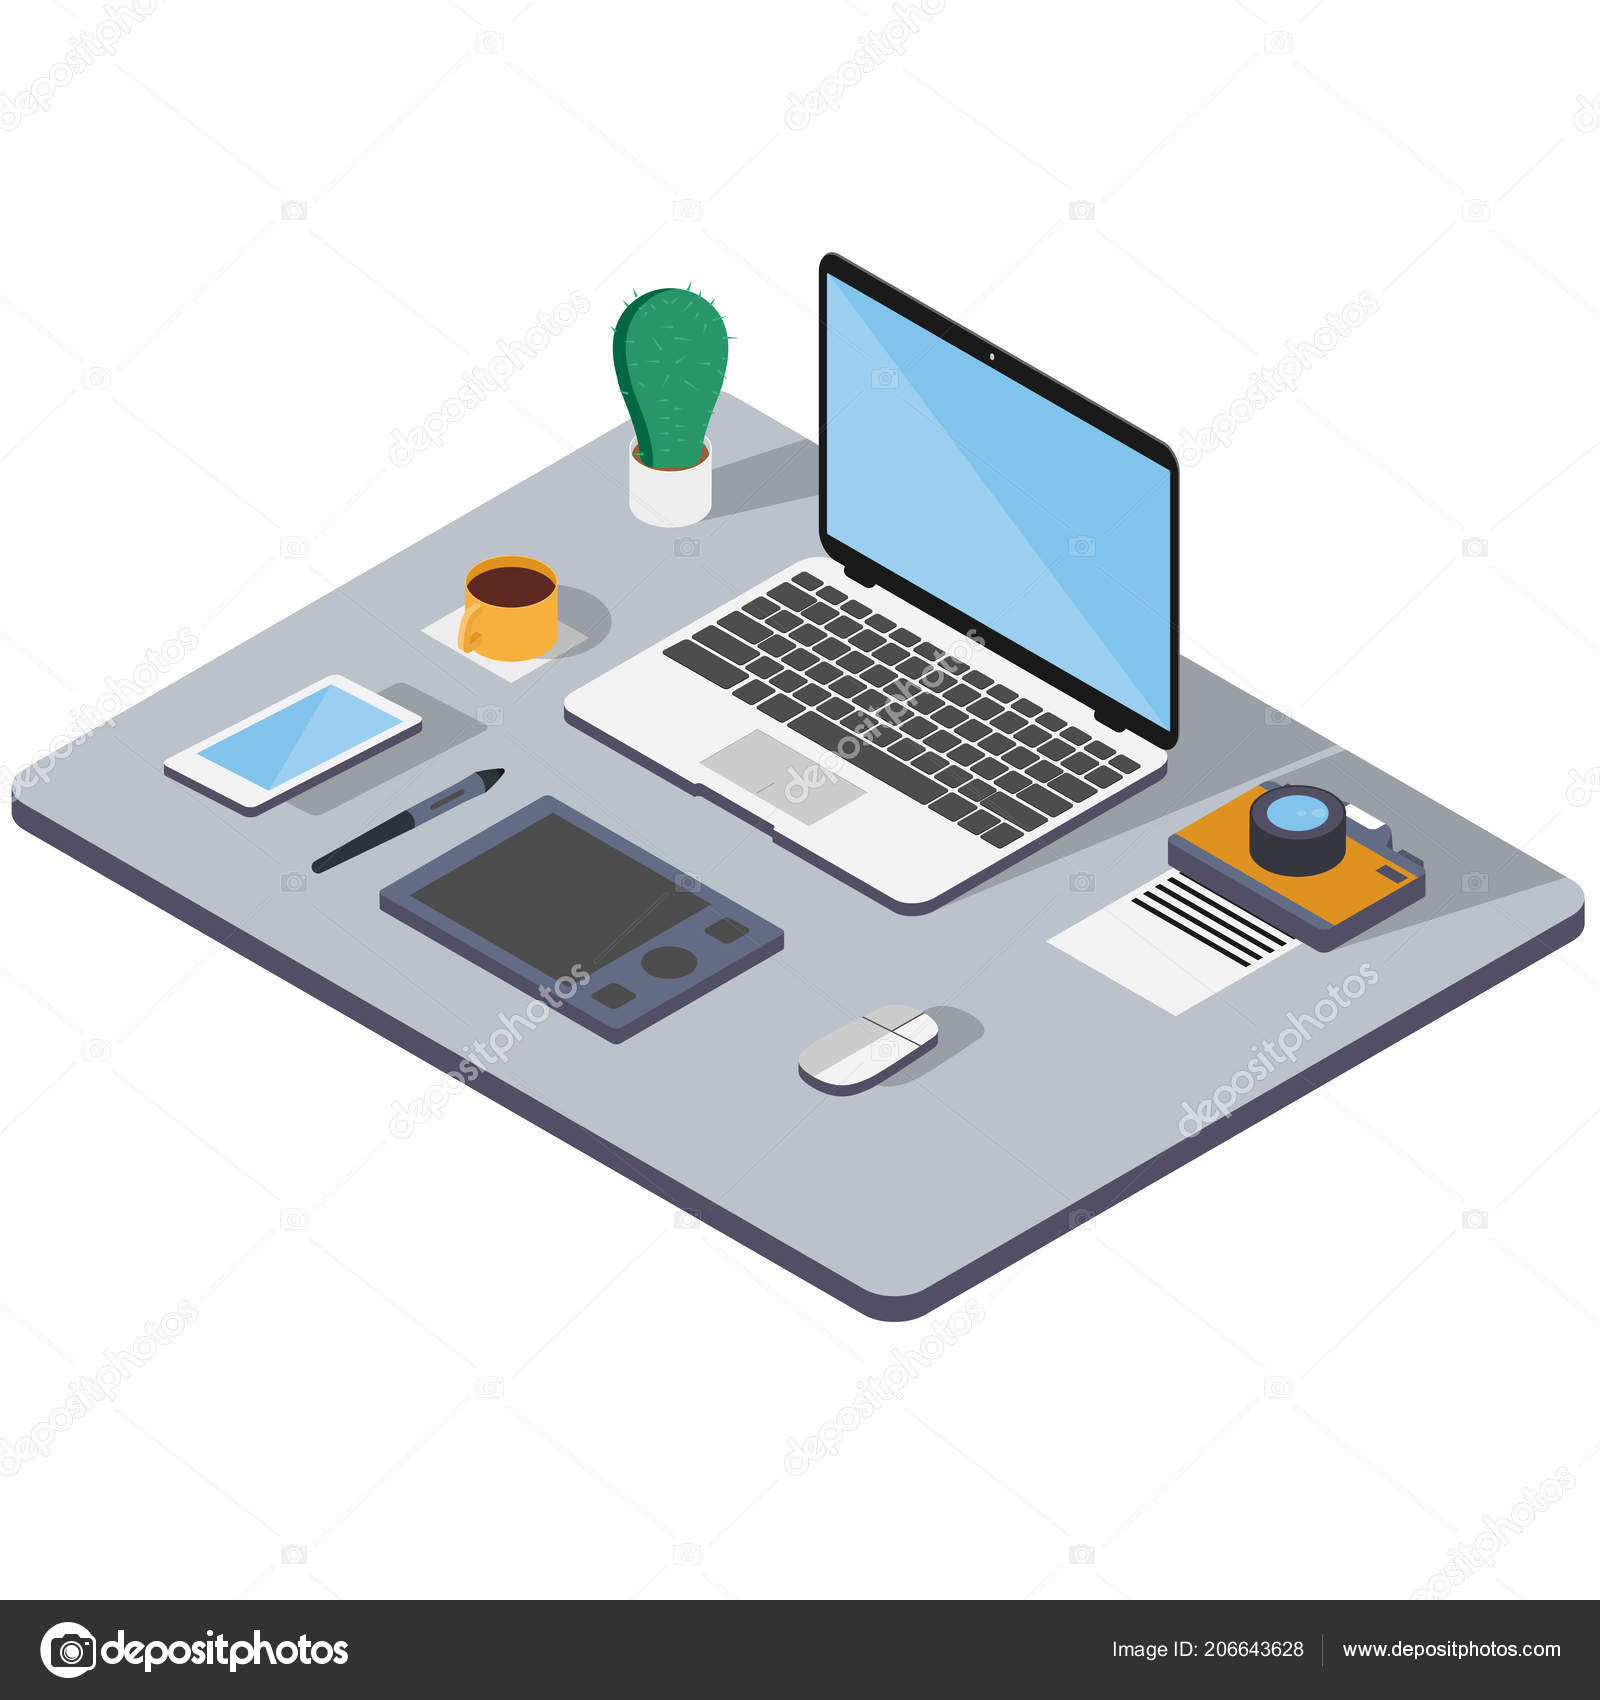 Workplace Office Web Designer Development Isometric Image Laptop Phone Graphics Stock Vector C Mirimage 206643628